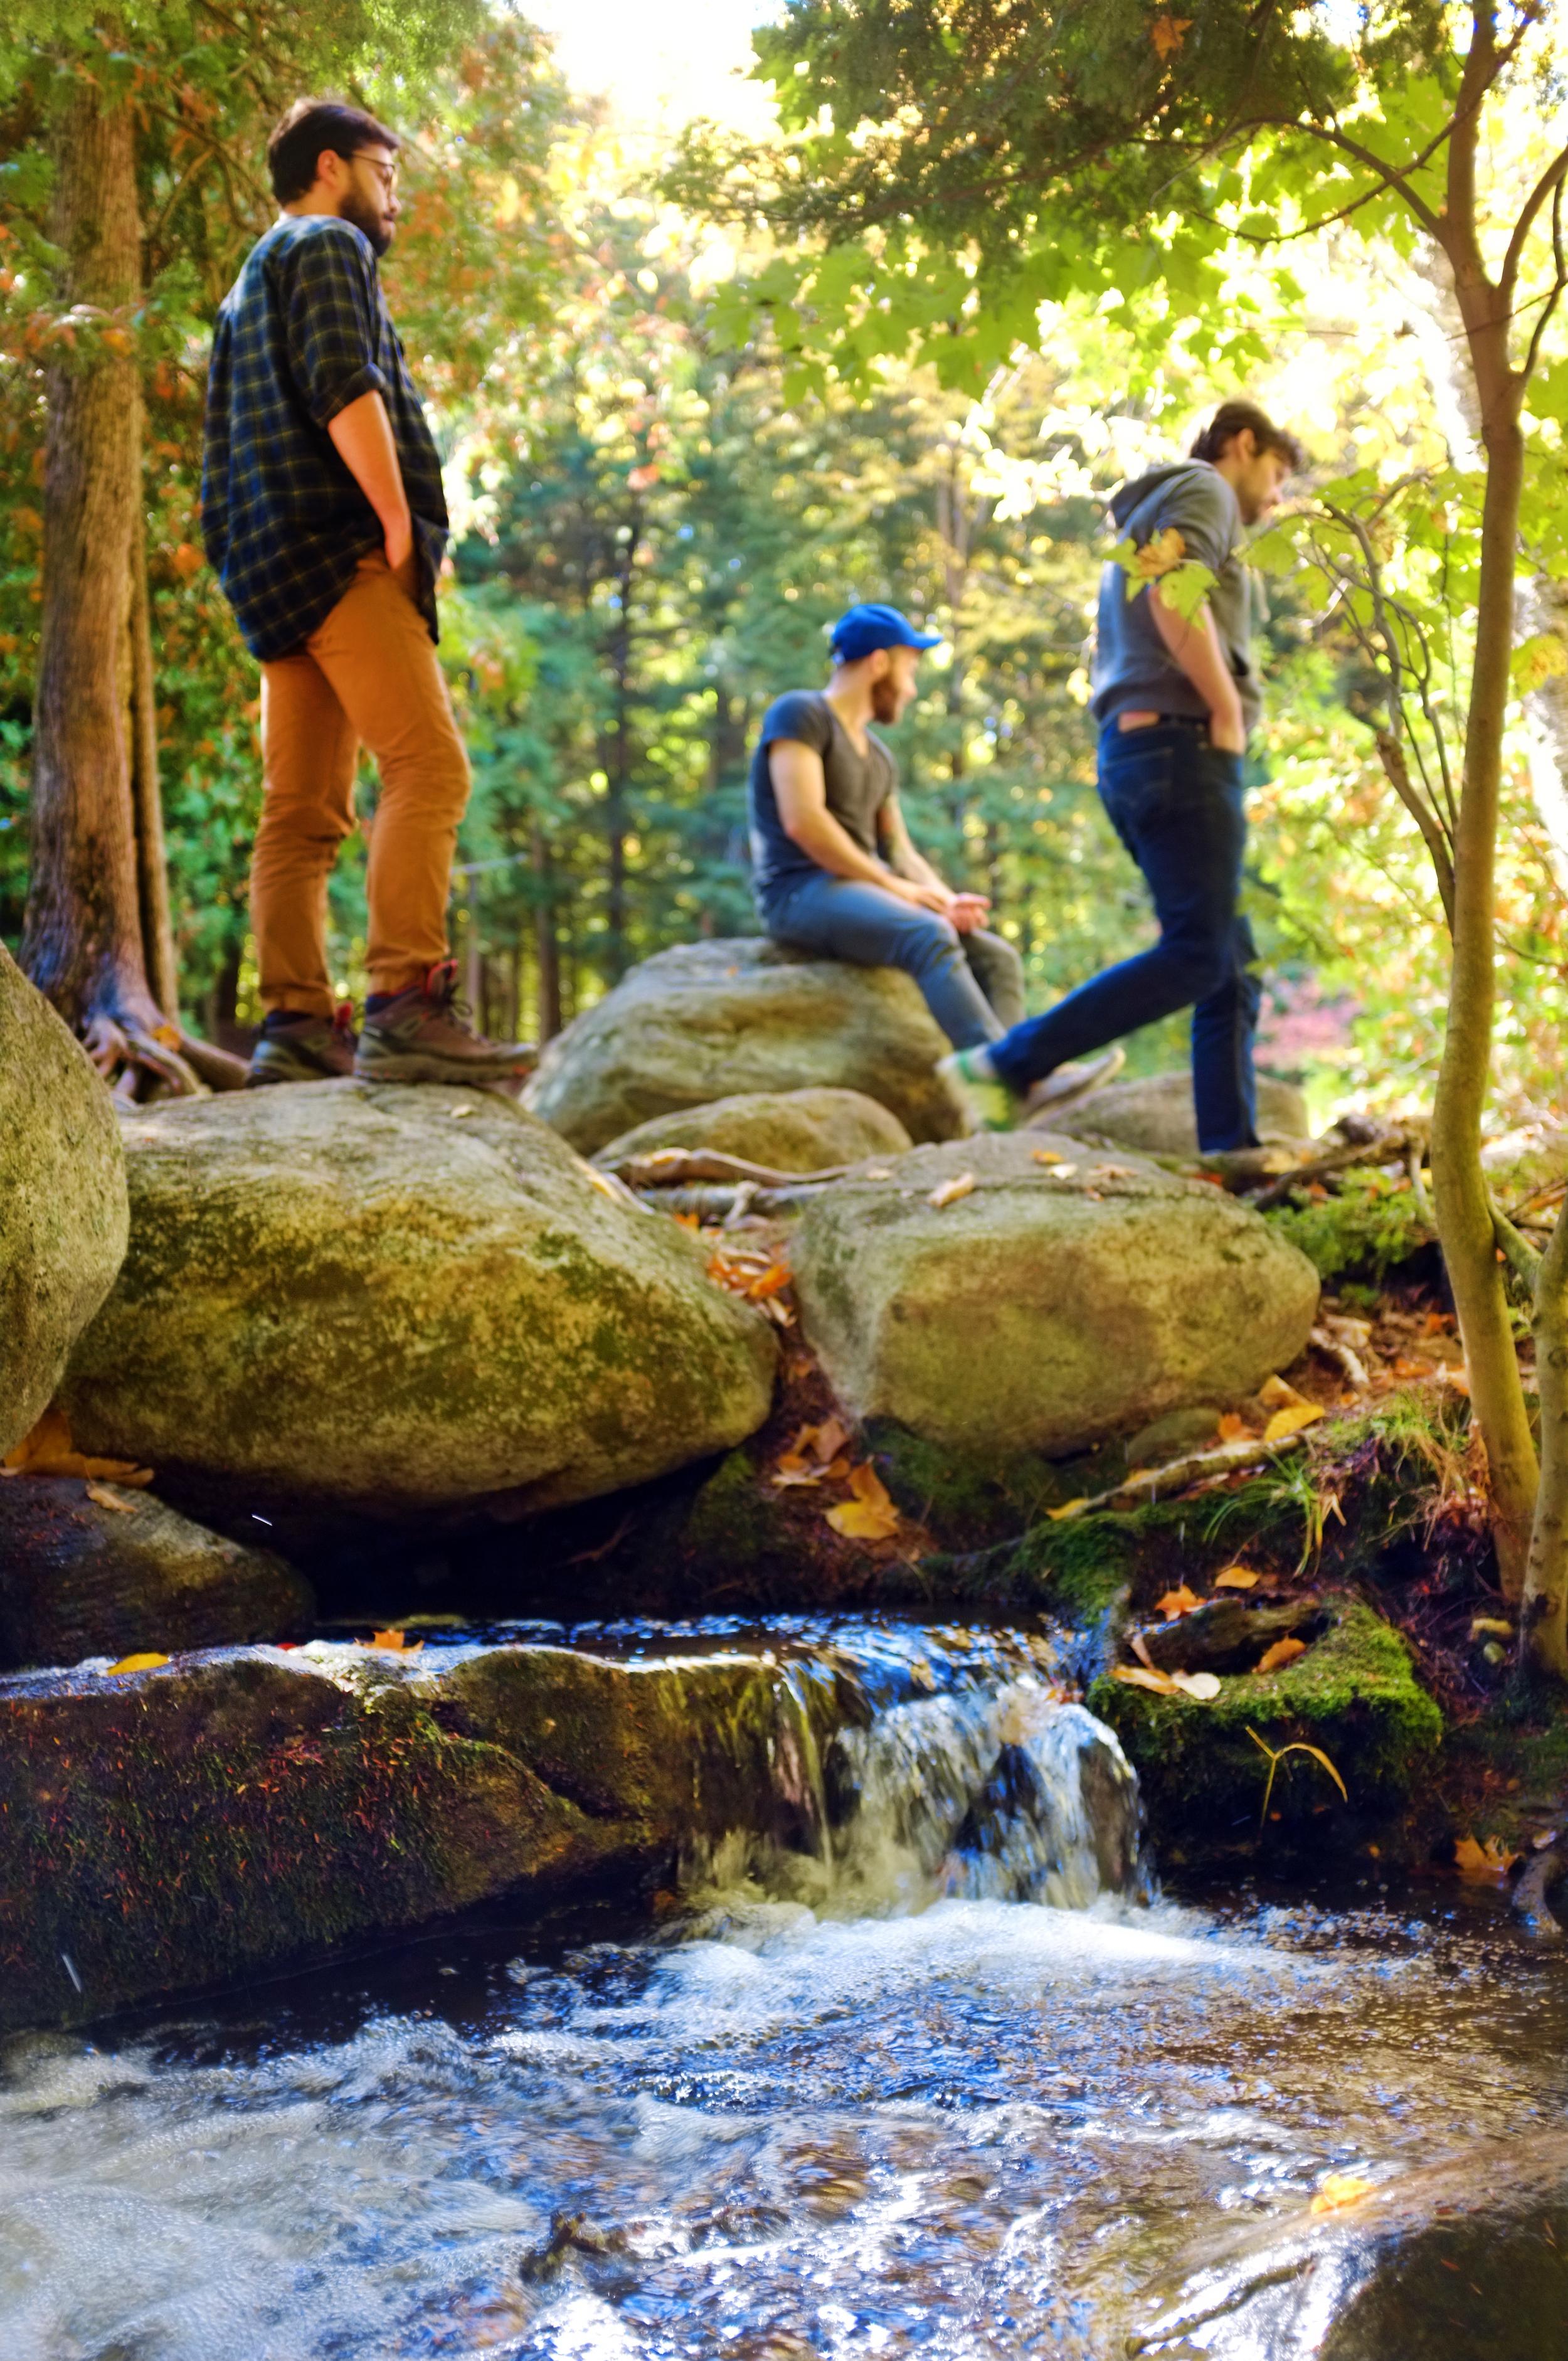 the_woods_of_minden_hills_minden_wild_water_preserve